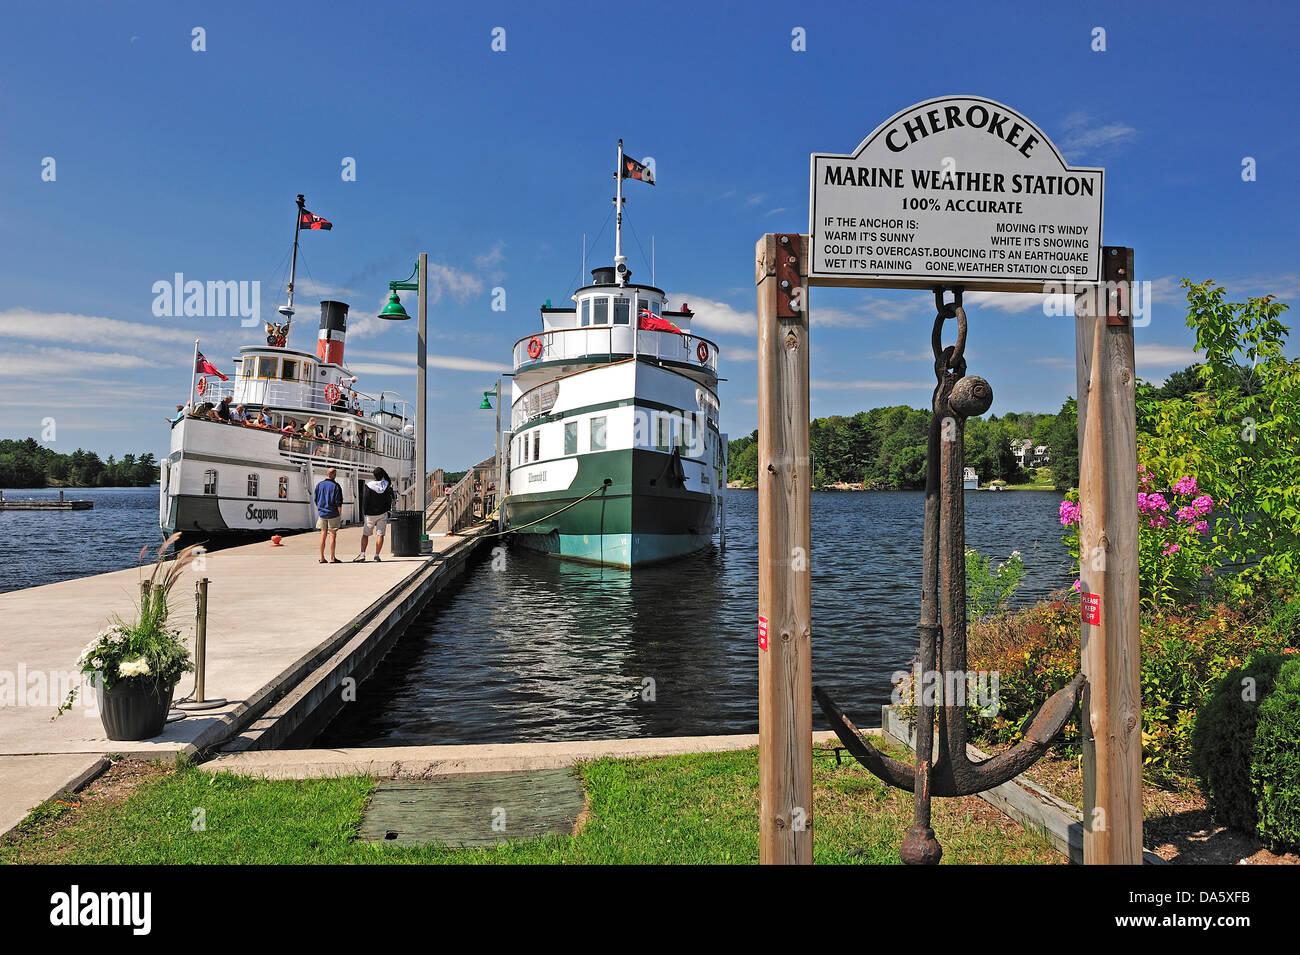 What To Sell >> Steamboat, Boat, Segwun, Lake Muskoka, Lake, Ontario, Canada Stock Photo, Royalty Free Image ...